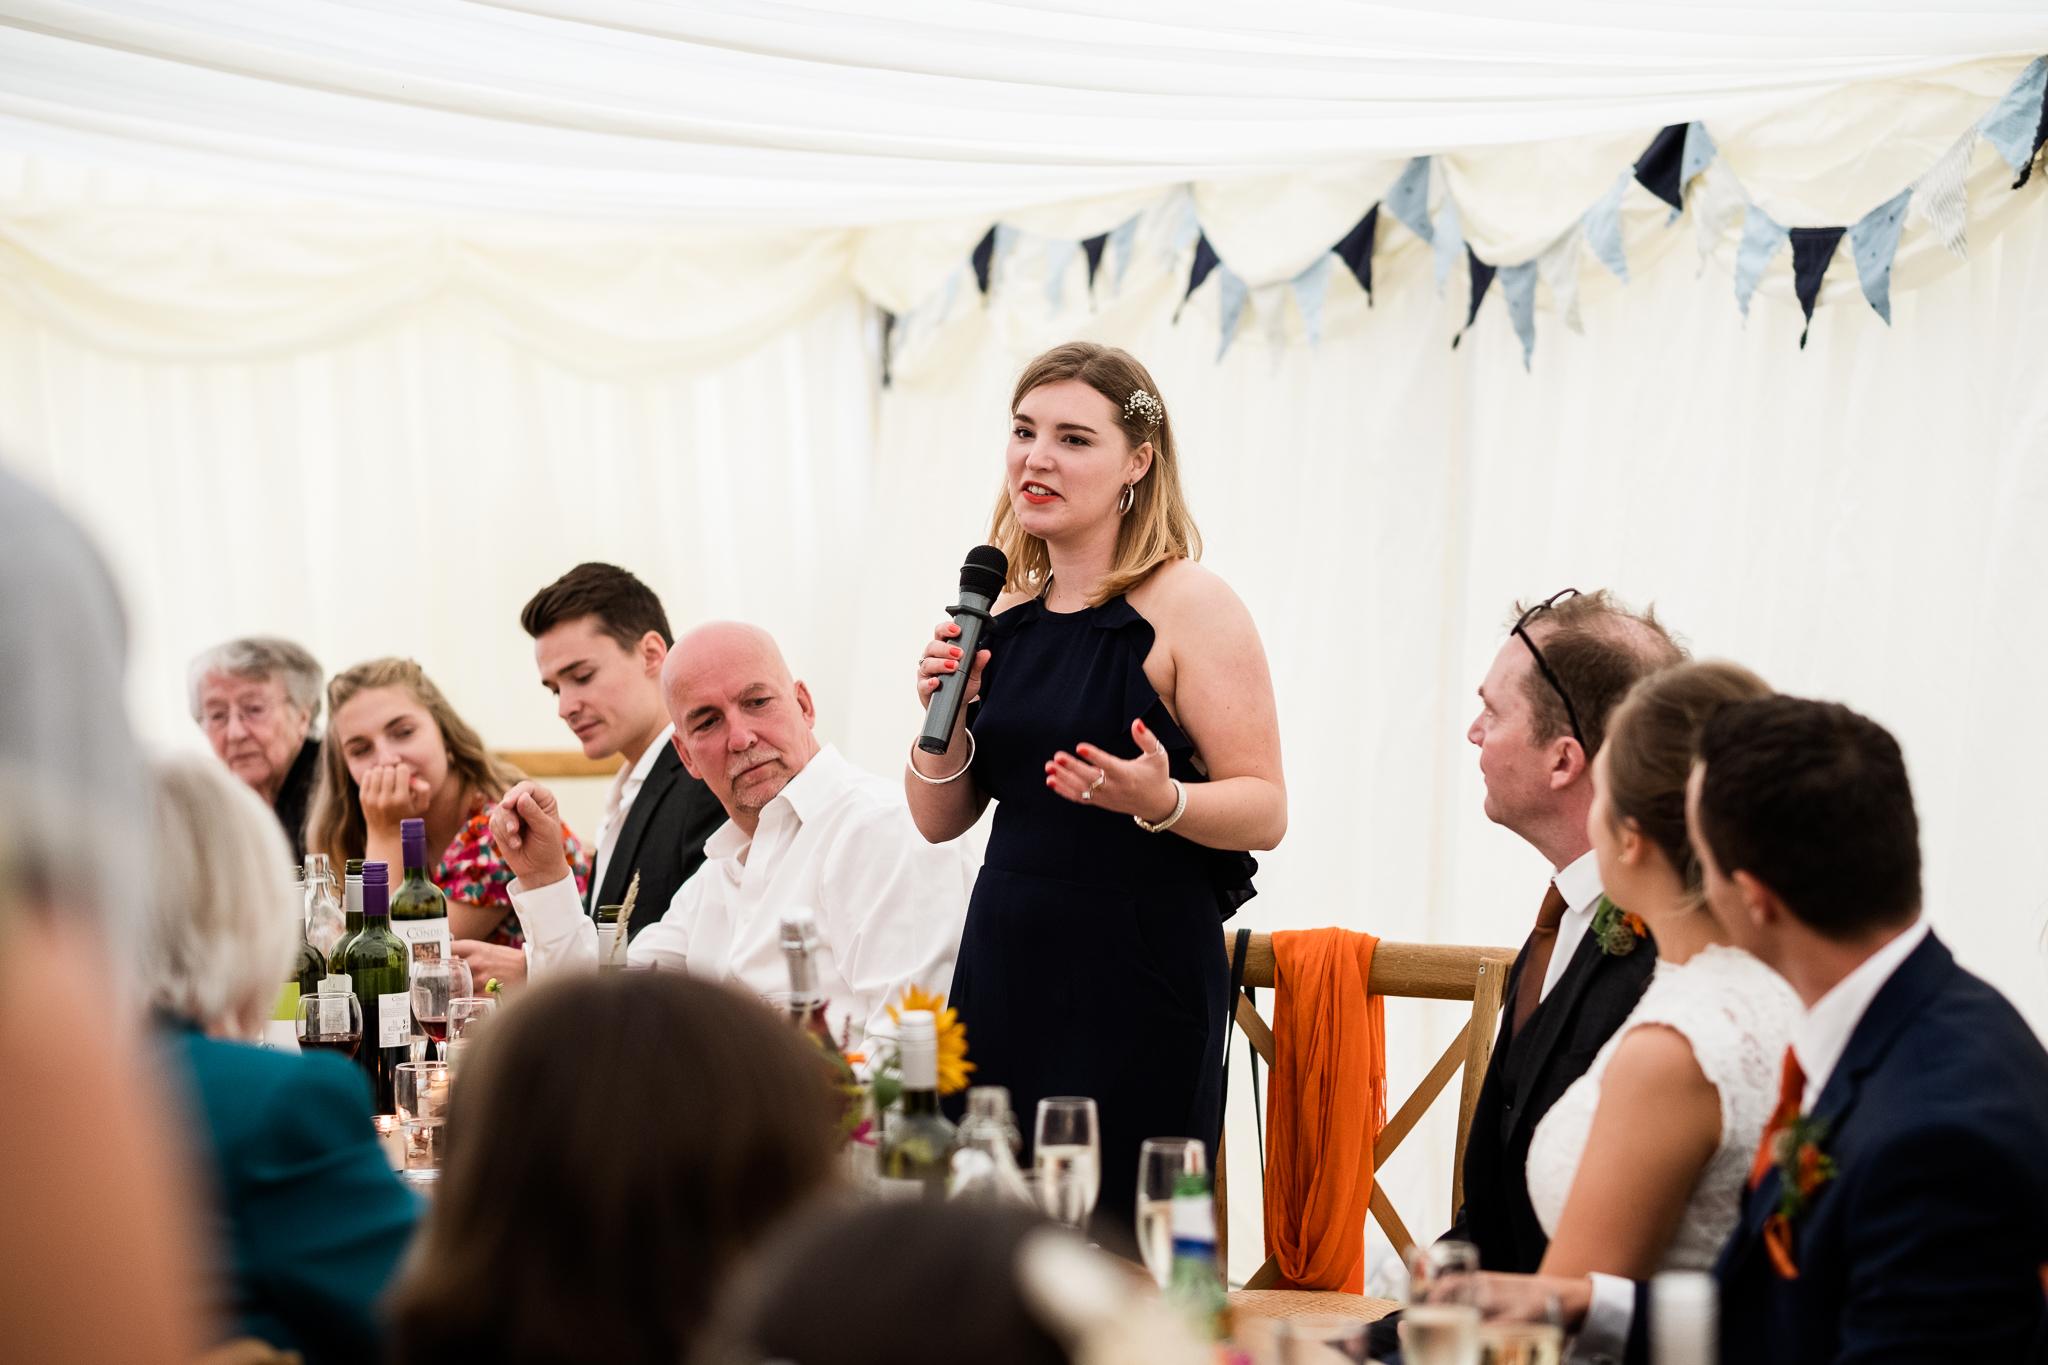 Relaxed Documentary Wedding Photography at The Wizard Inn, Alderley Edge Cheshire - Jenny Harper-61.jpg